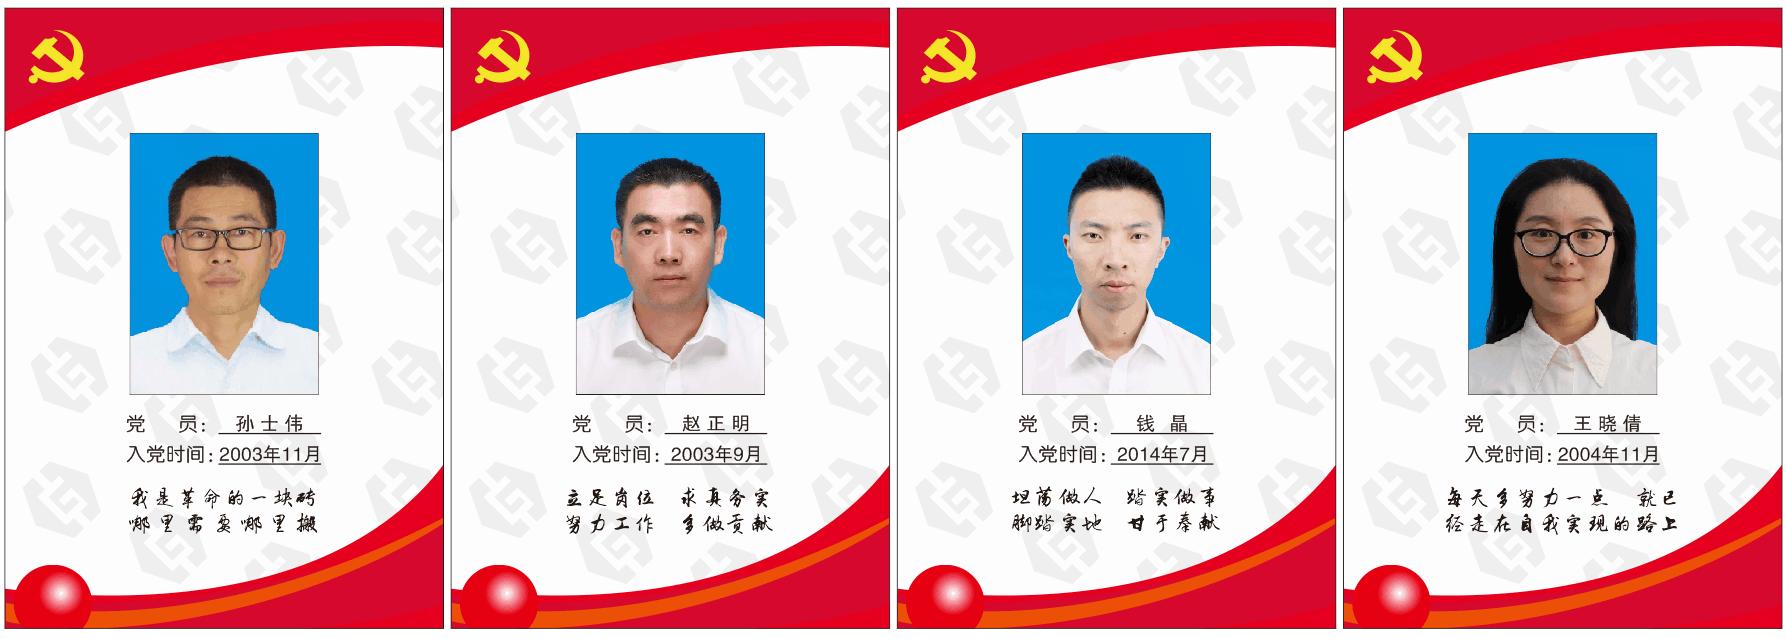 QQ图片20181206152938.png